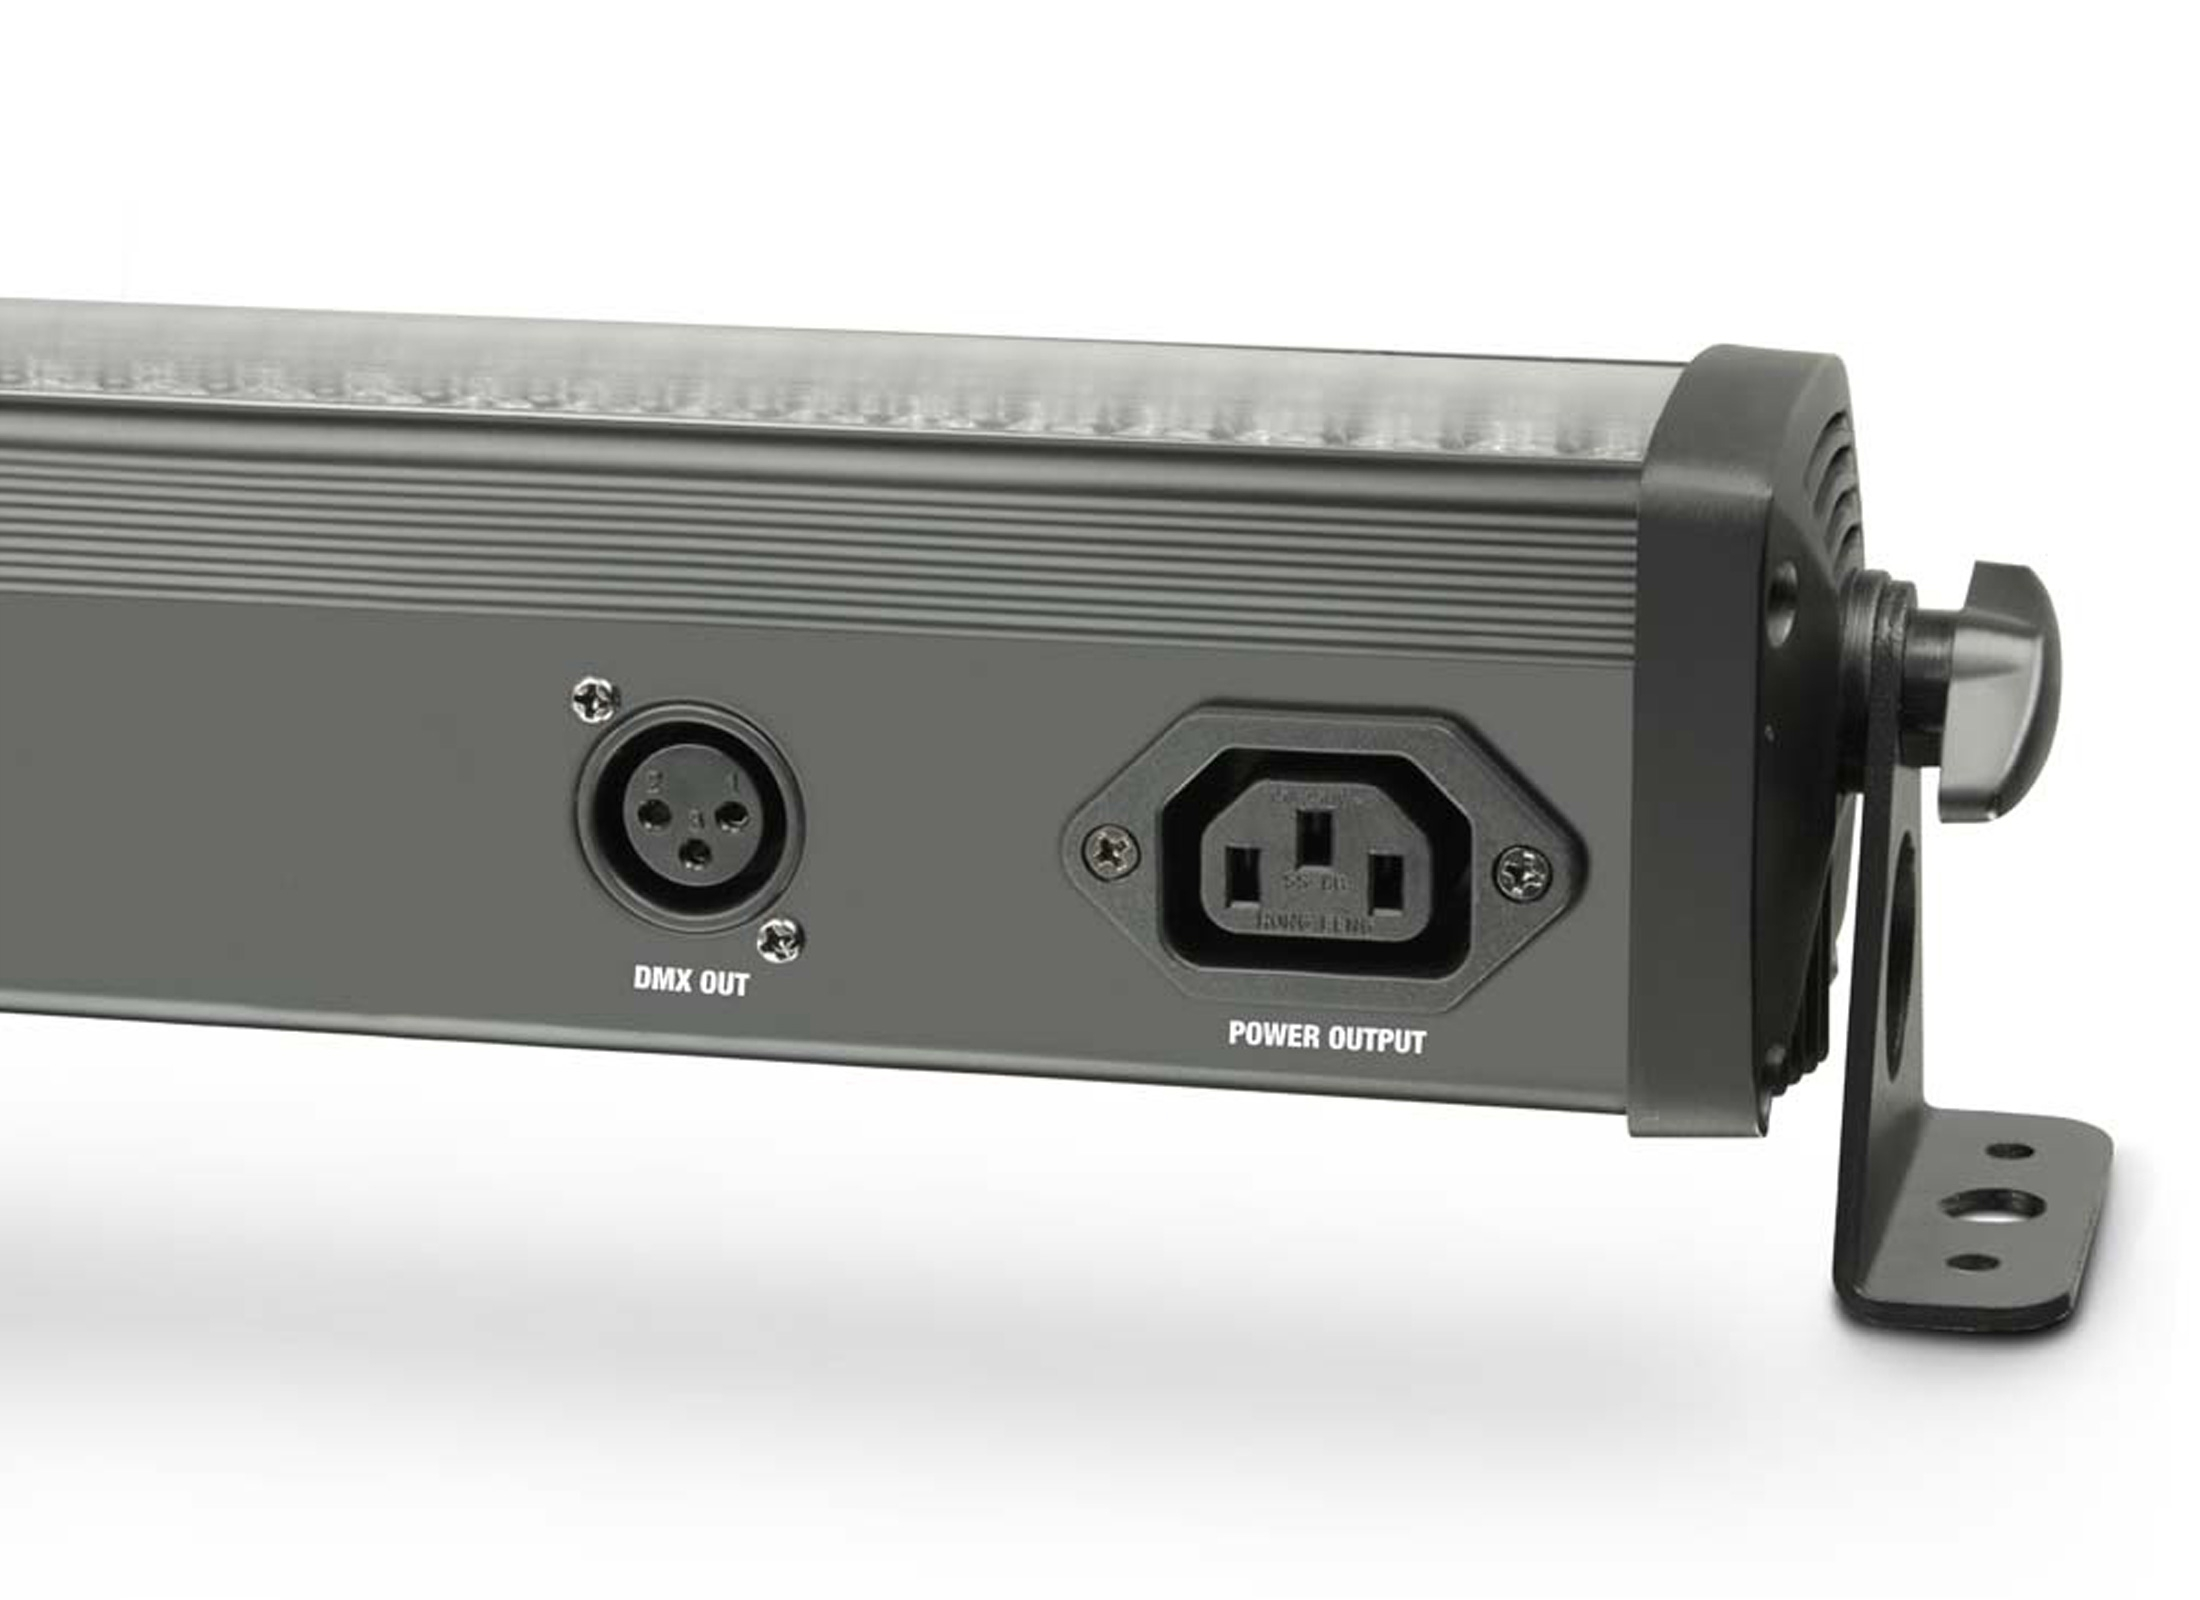 Cameo BAR 10 RGB IR LED Bar, black Online At Low Prices At Huss ...